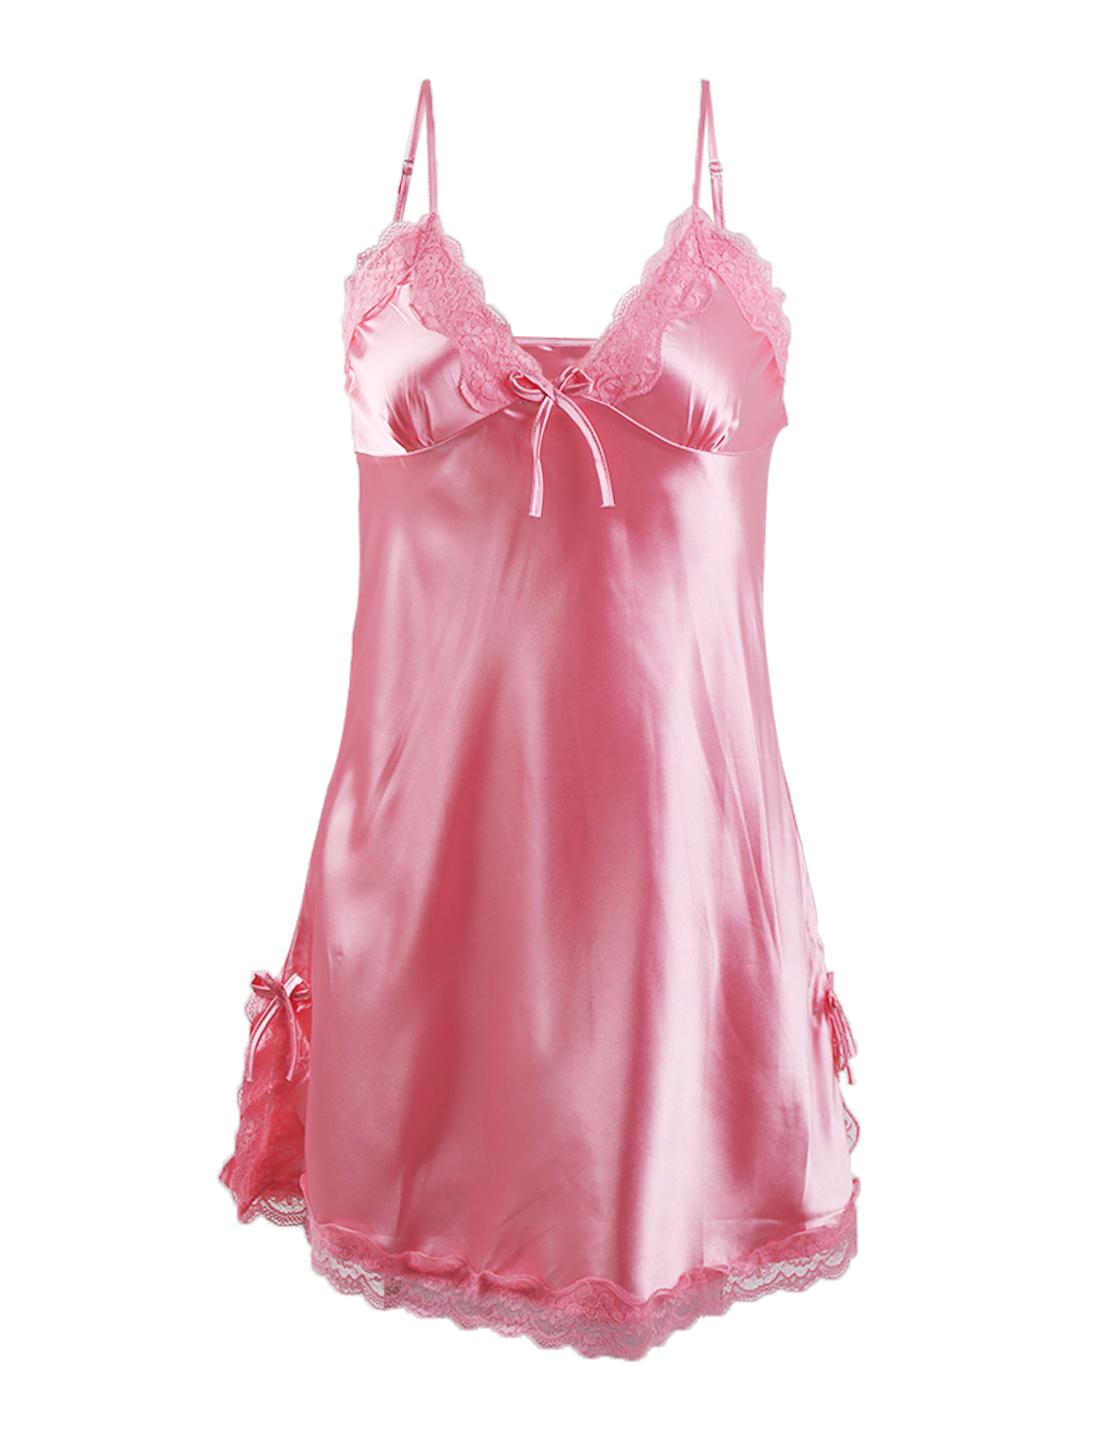 Women Sexy Satin Lace Trim Sleepwear Nightgown Pajama Slip Dress Pink-Lace M